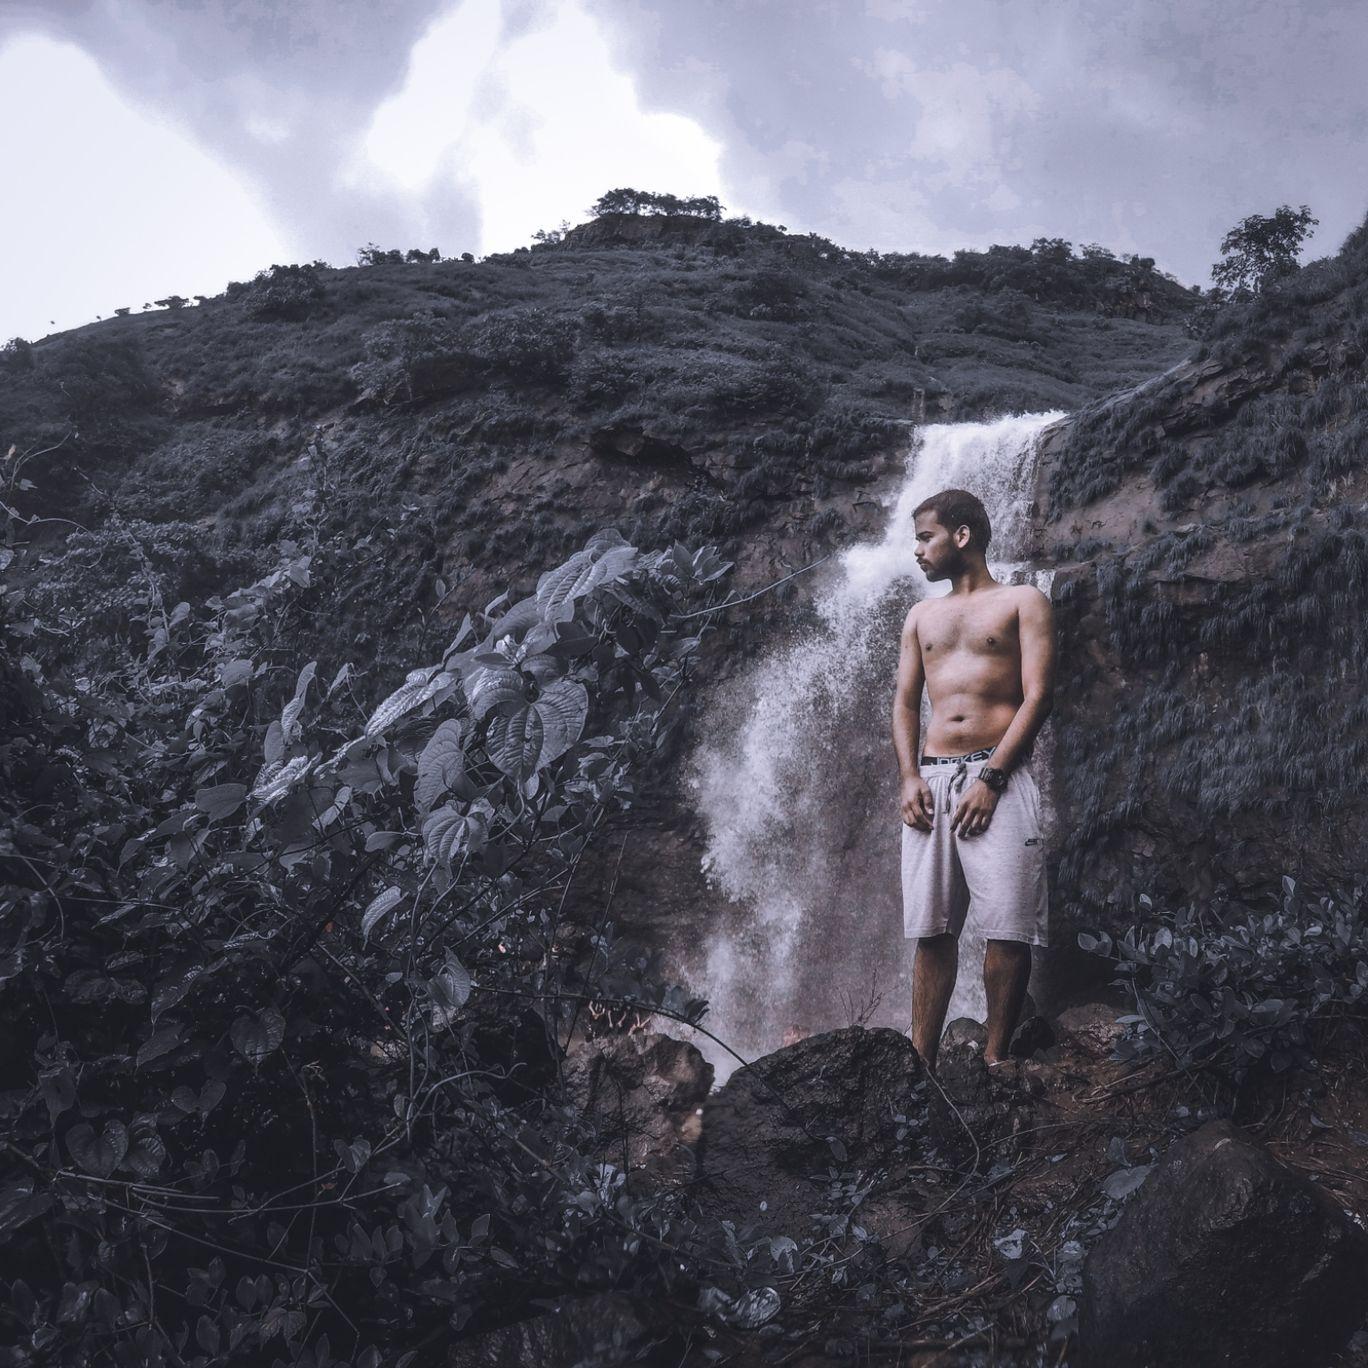 Photo of Bhivpuri waterfalls near neral By Pankaj Rai